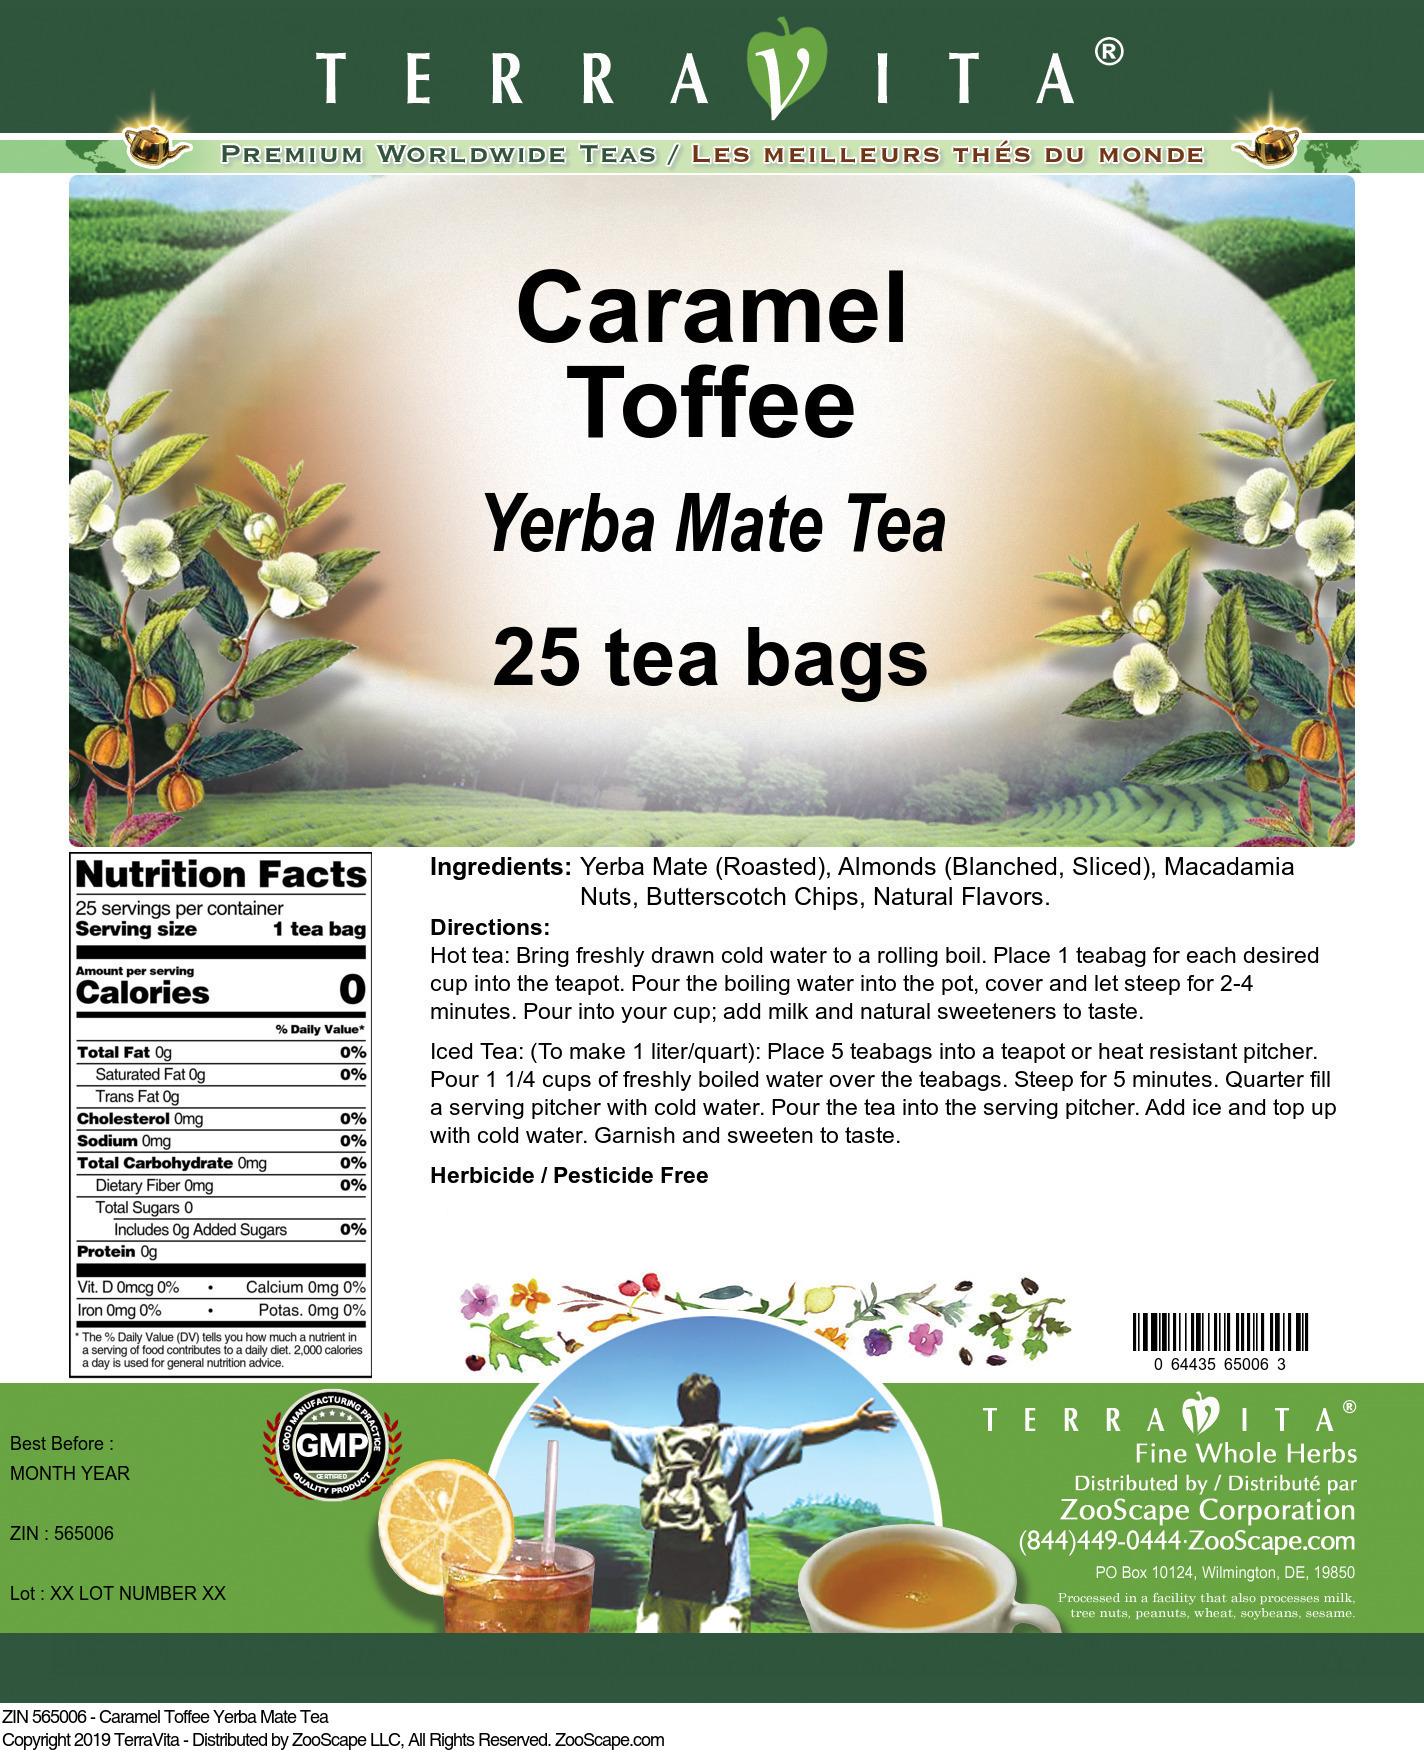 Caramel Toffee Yerba Mate